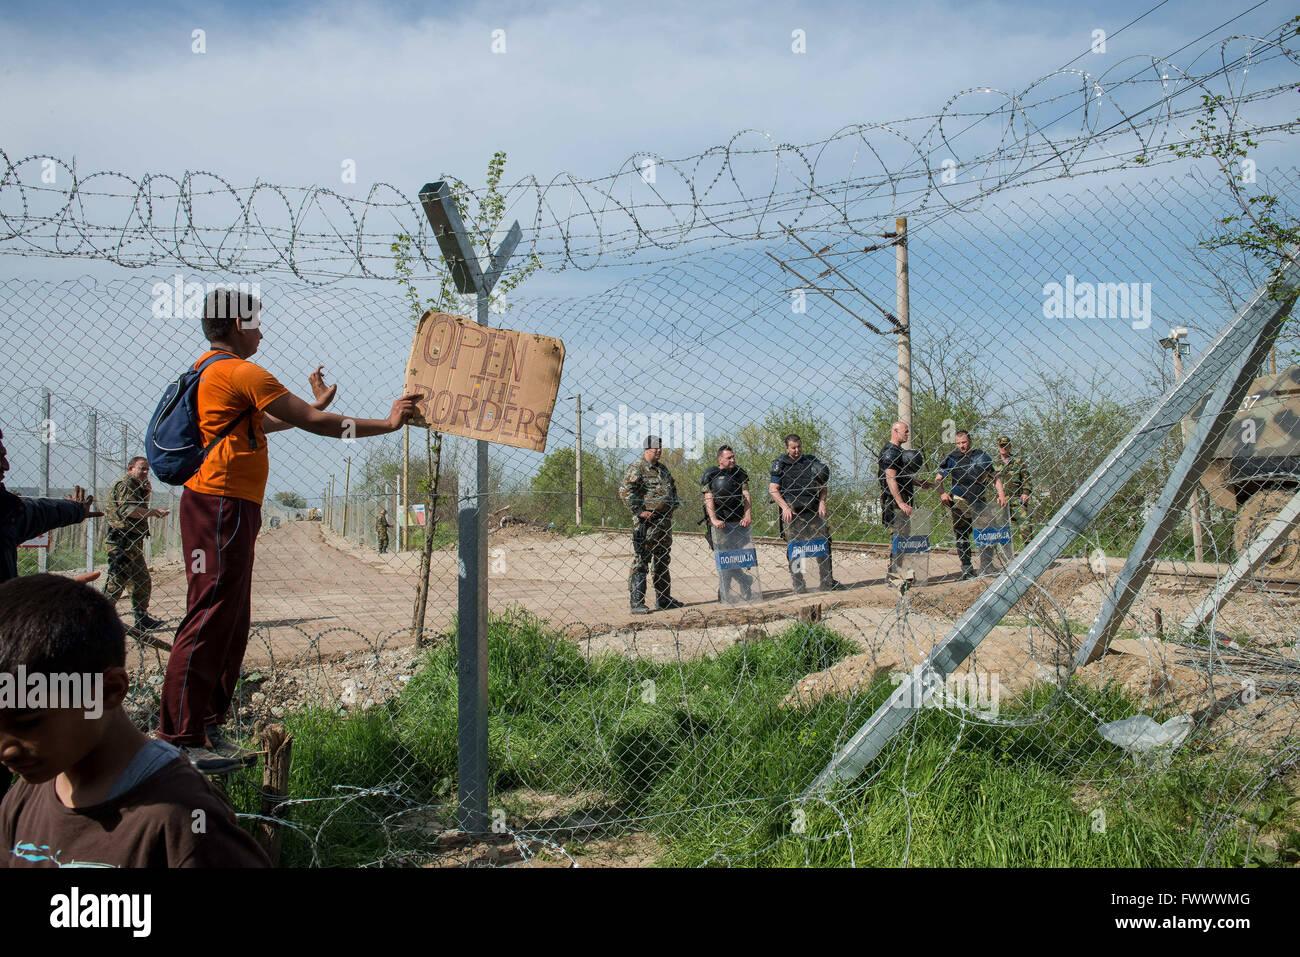 Idomeni, Greece. 7th Apr, 2016. 12,000 refugees remain in limbo in the Greek border town of Idomeni. A comprehensive - Stock Image